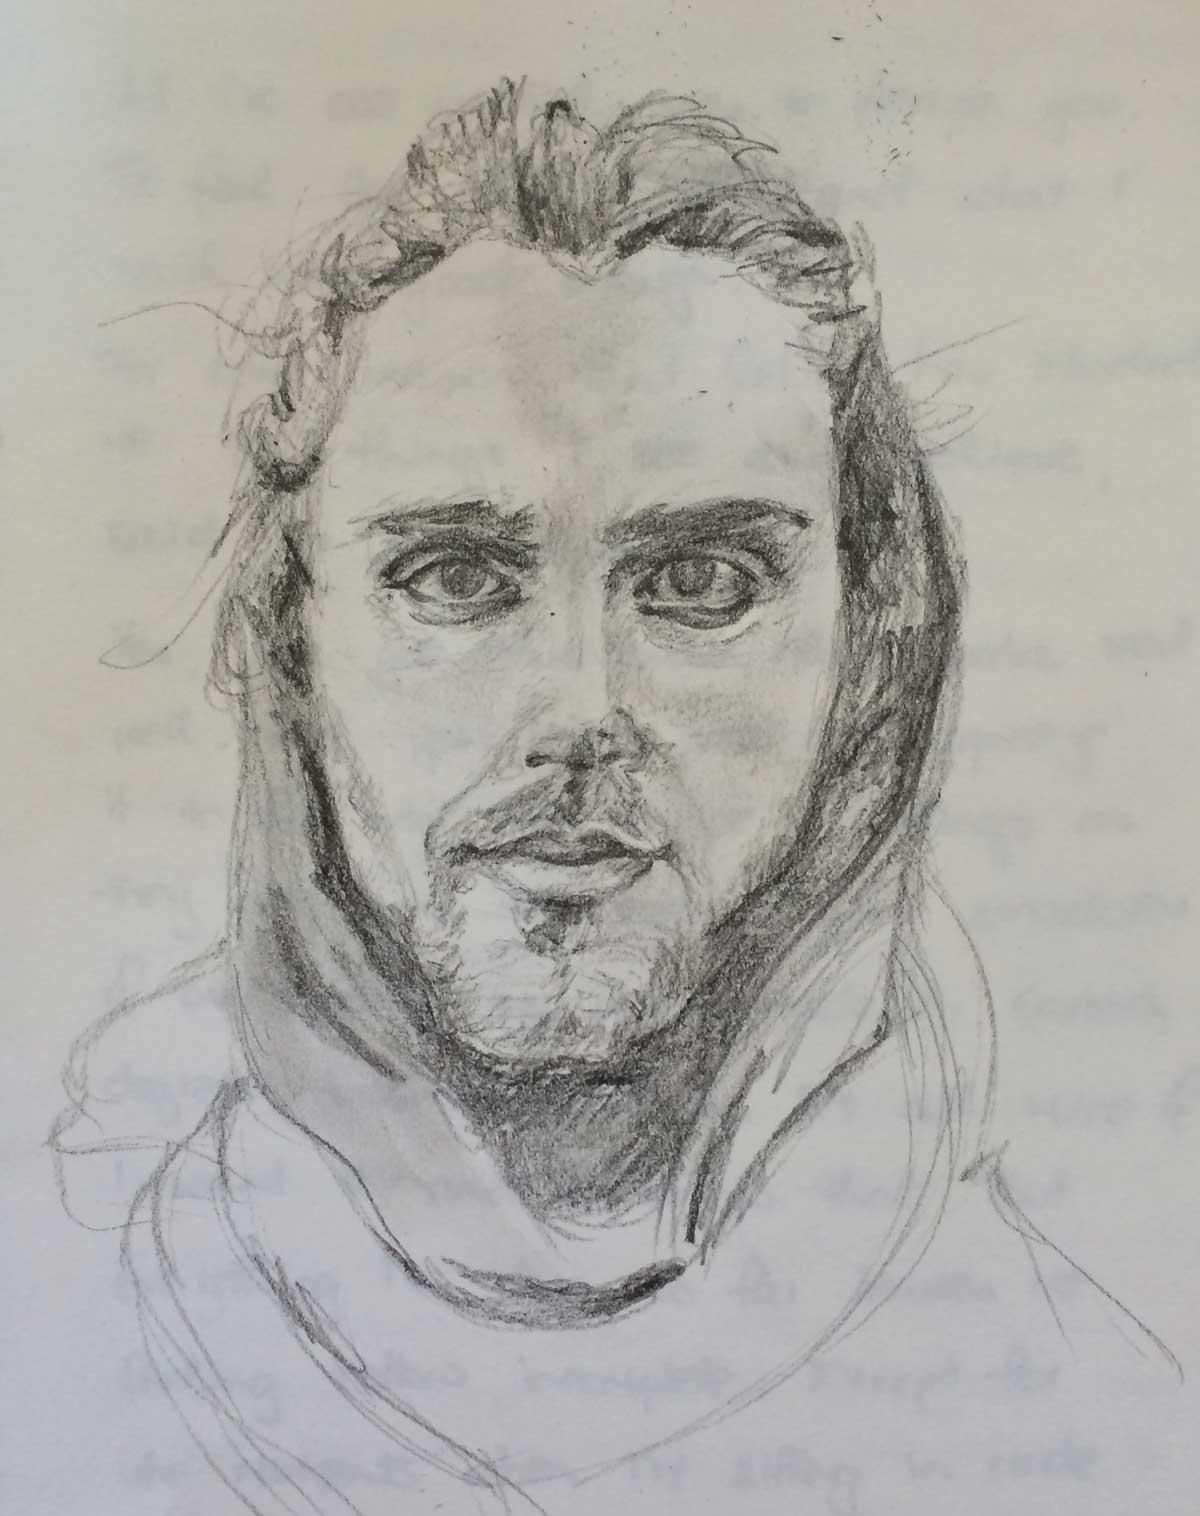 Dimitri_portrait.jpg